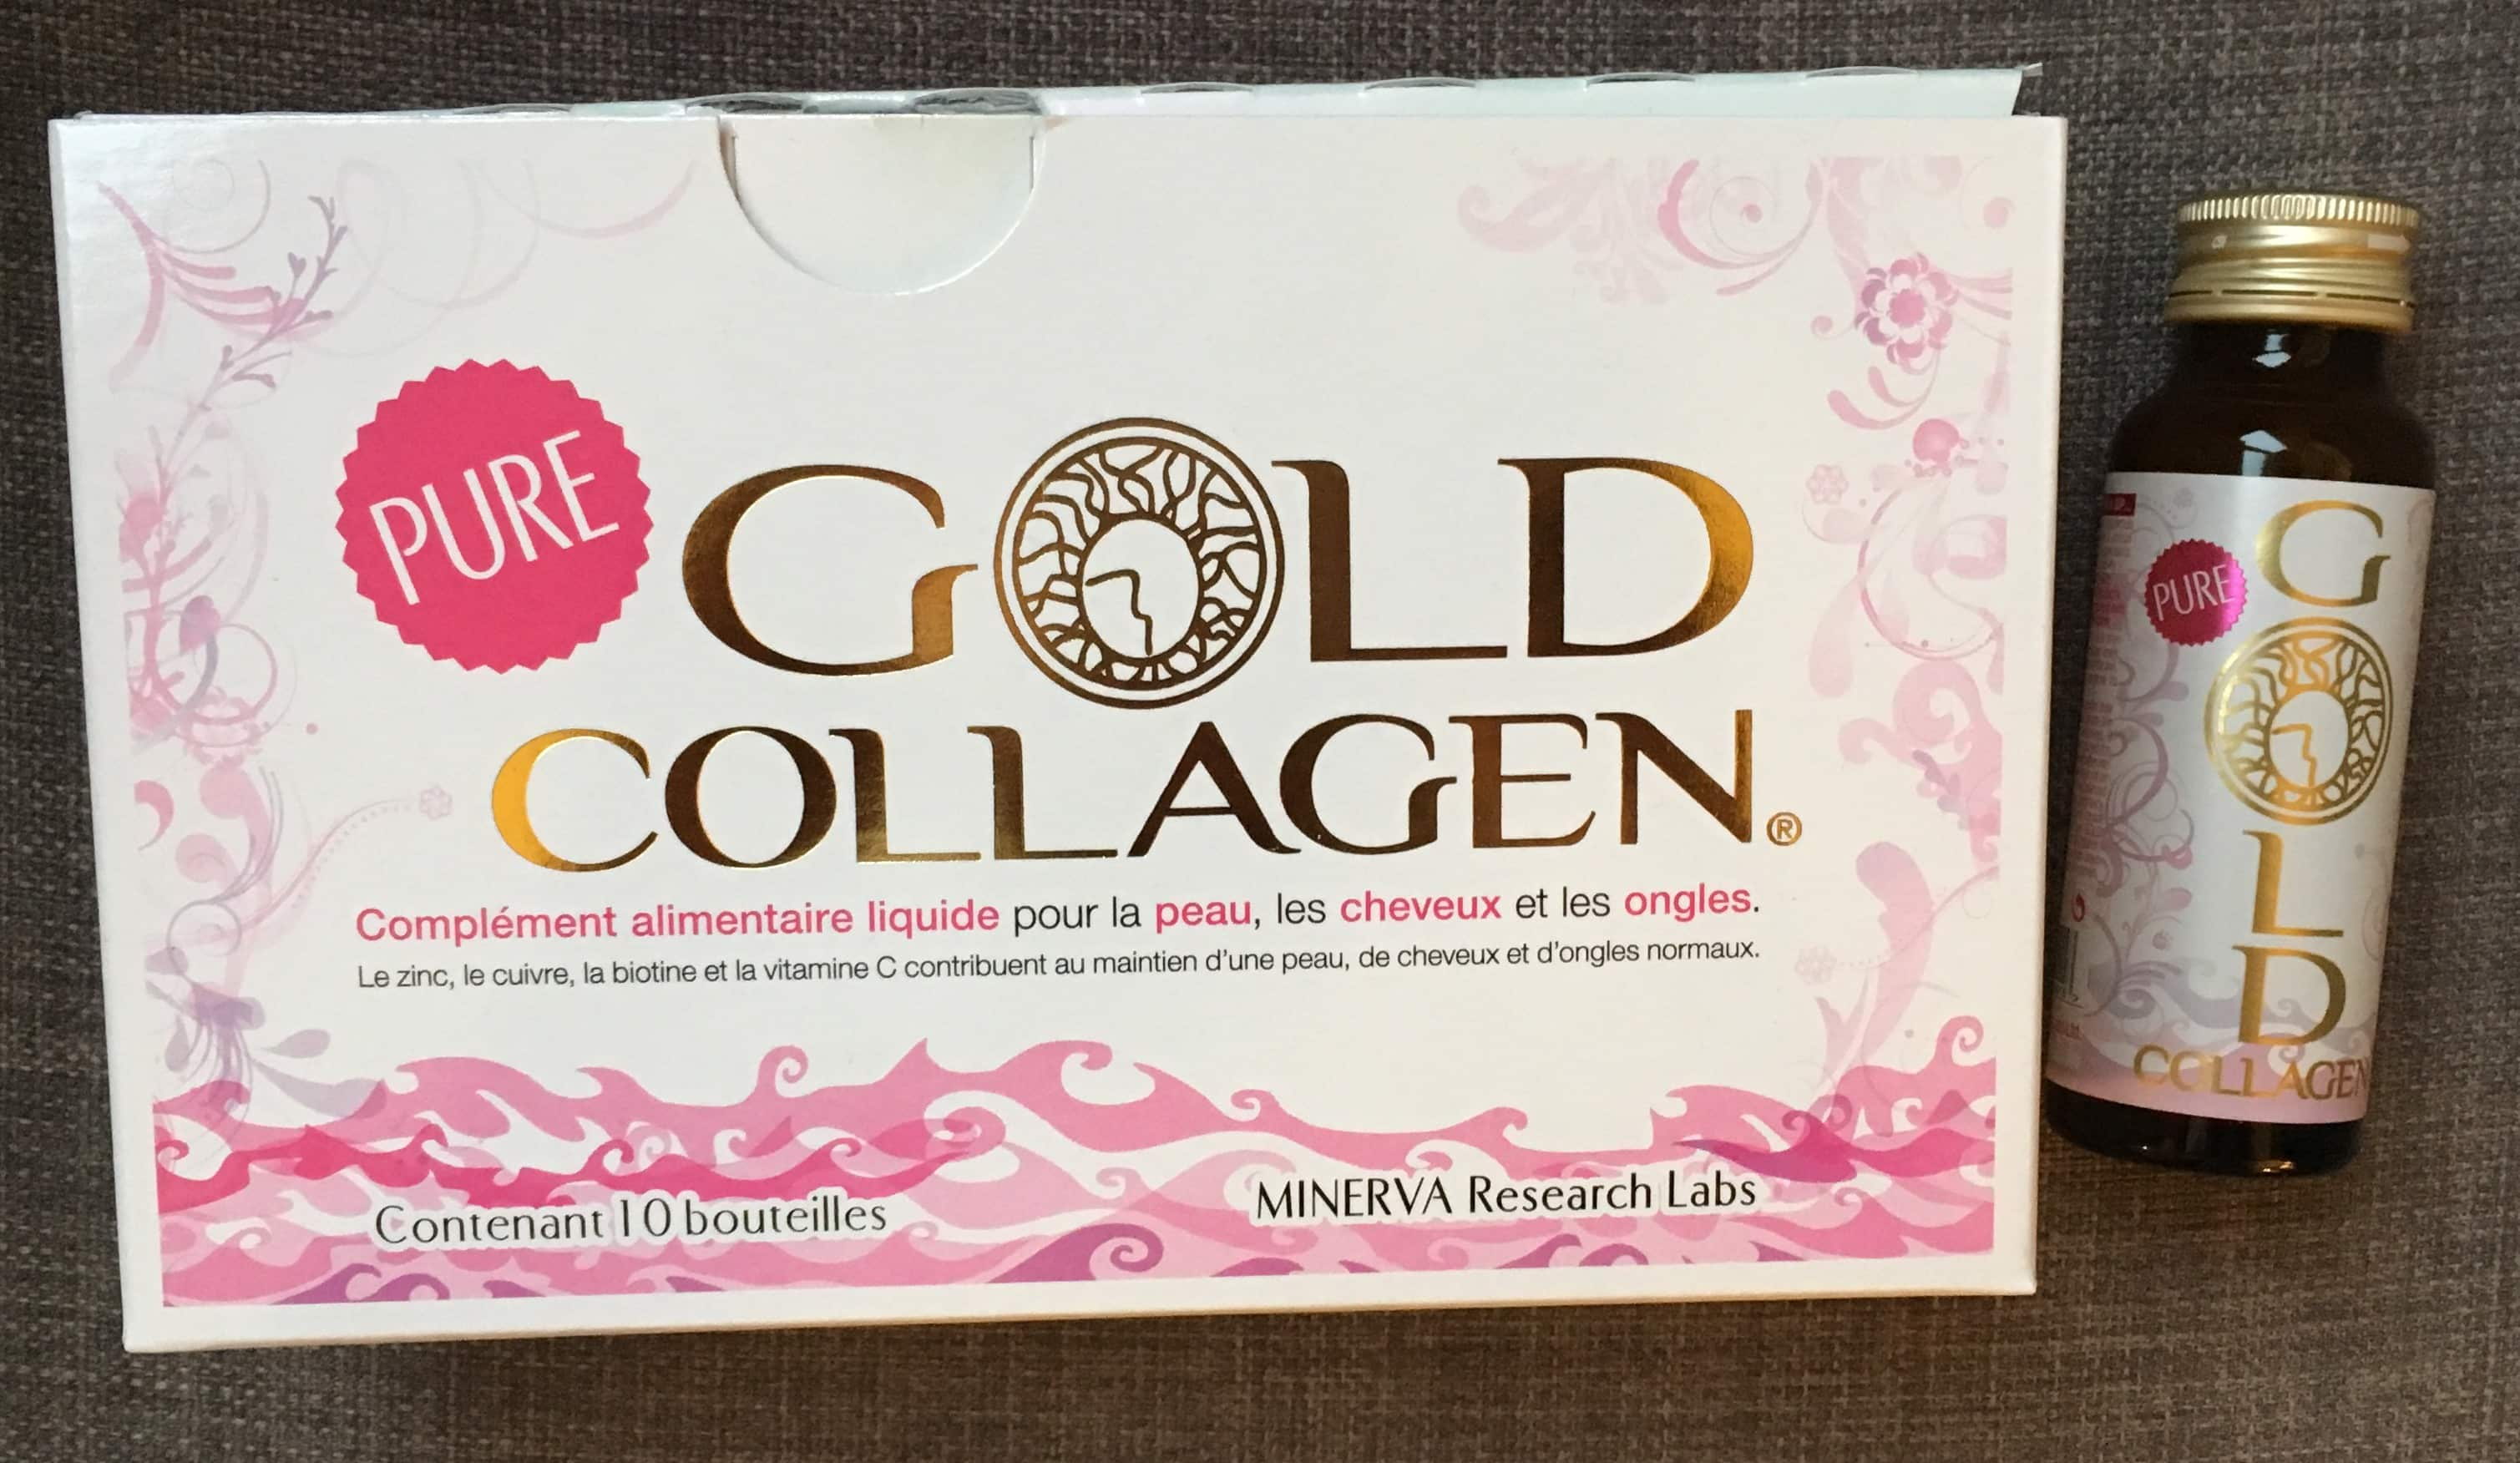 pure gold collagen un compl ment alimentaire liquide. Black Bedroom Furniture Sets. Home Design Ideas